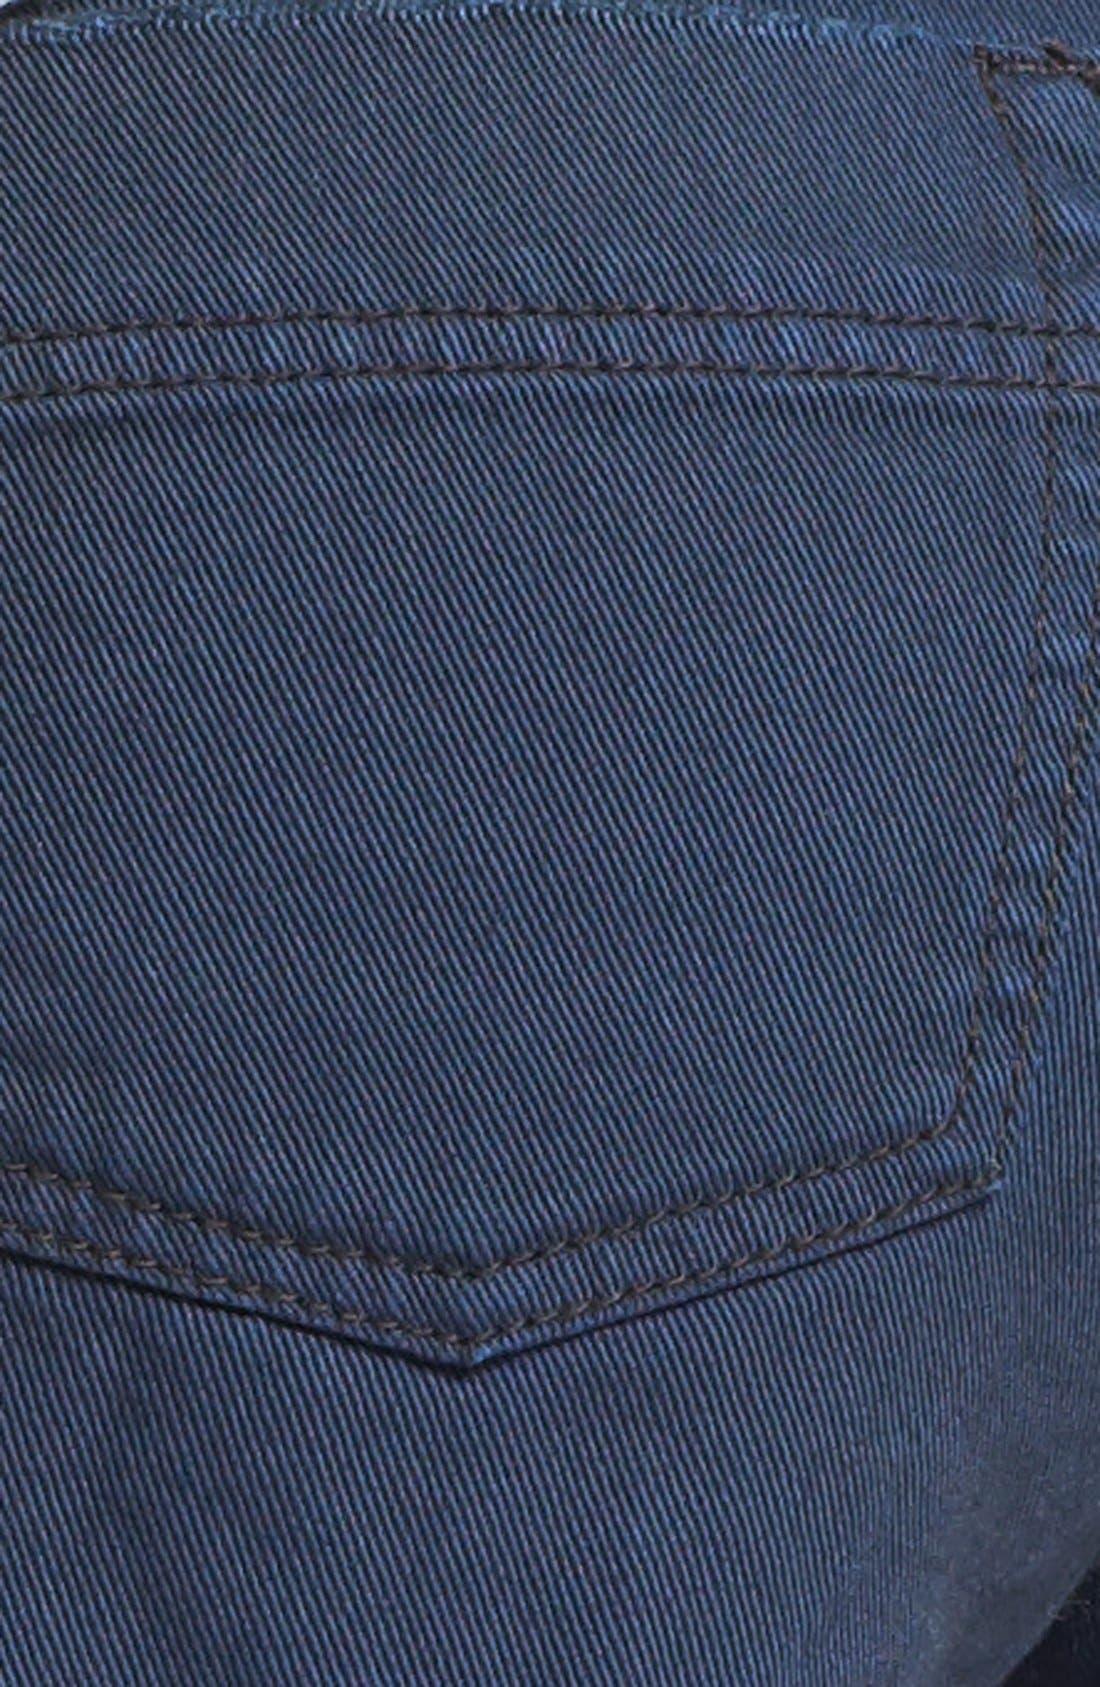 'Dolphin' Cutoff Denim Shorts,                             Alternate thumbnail 19, color,